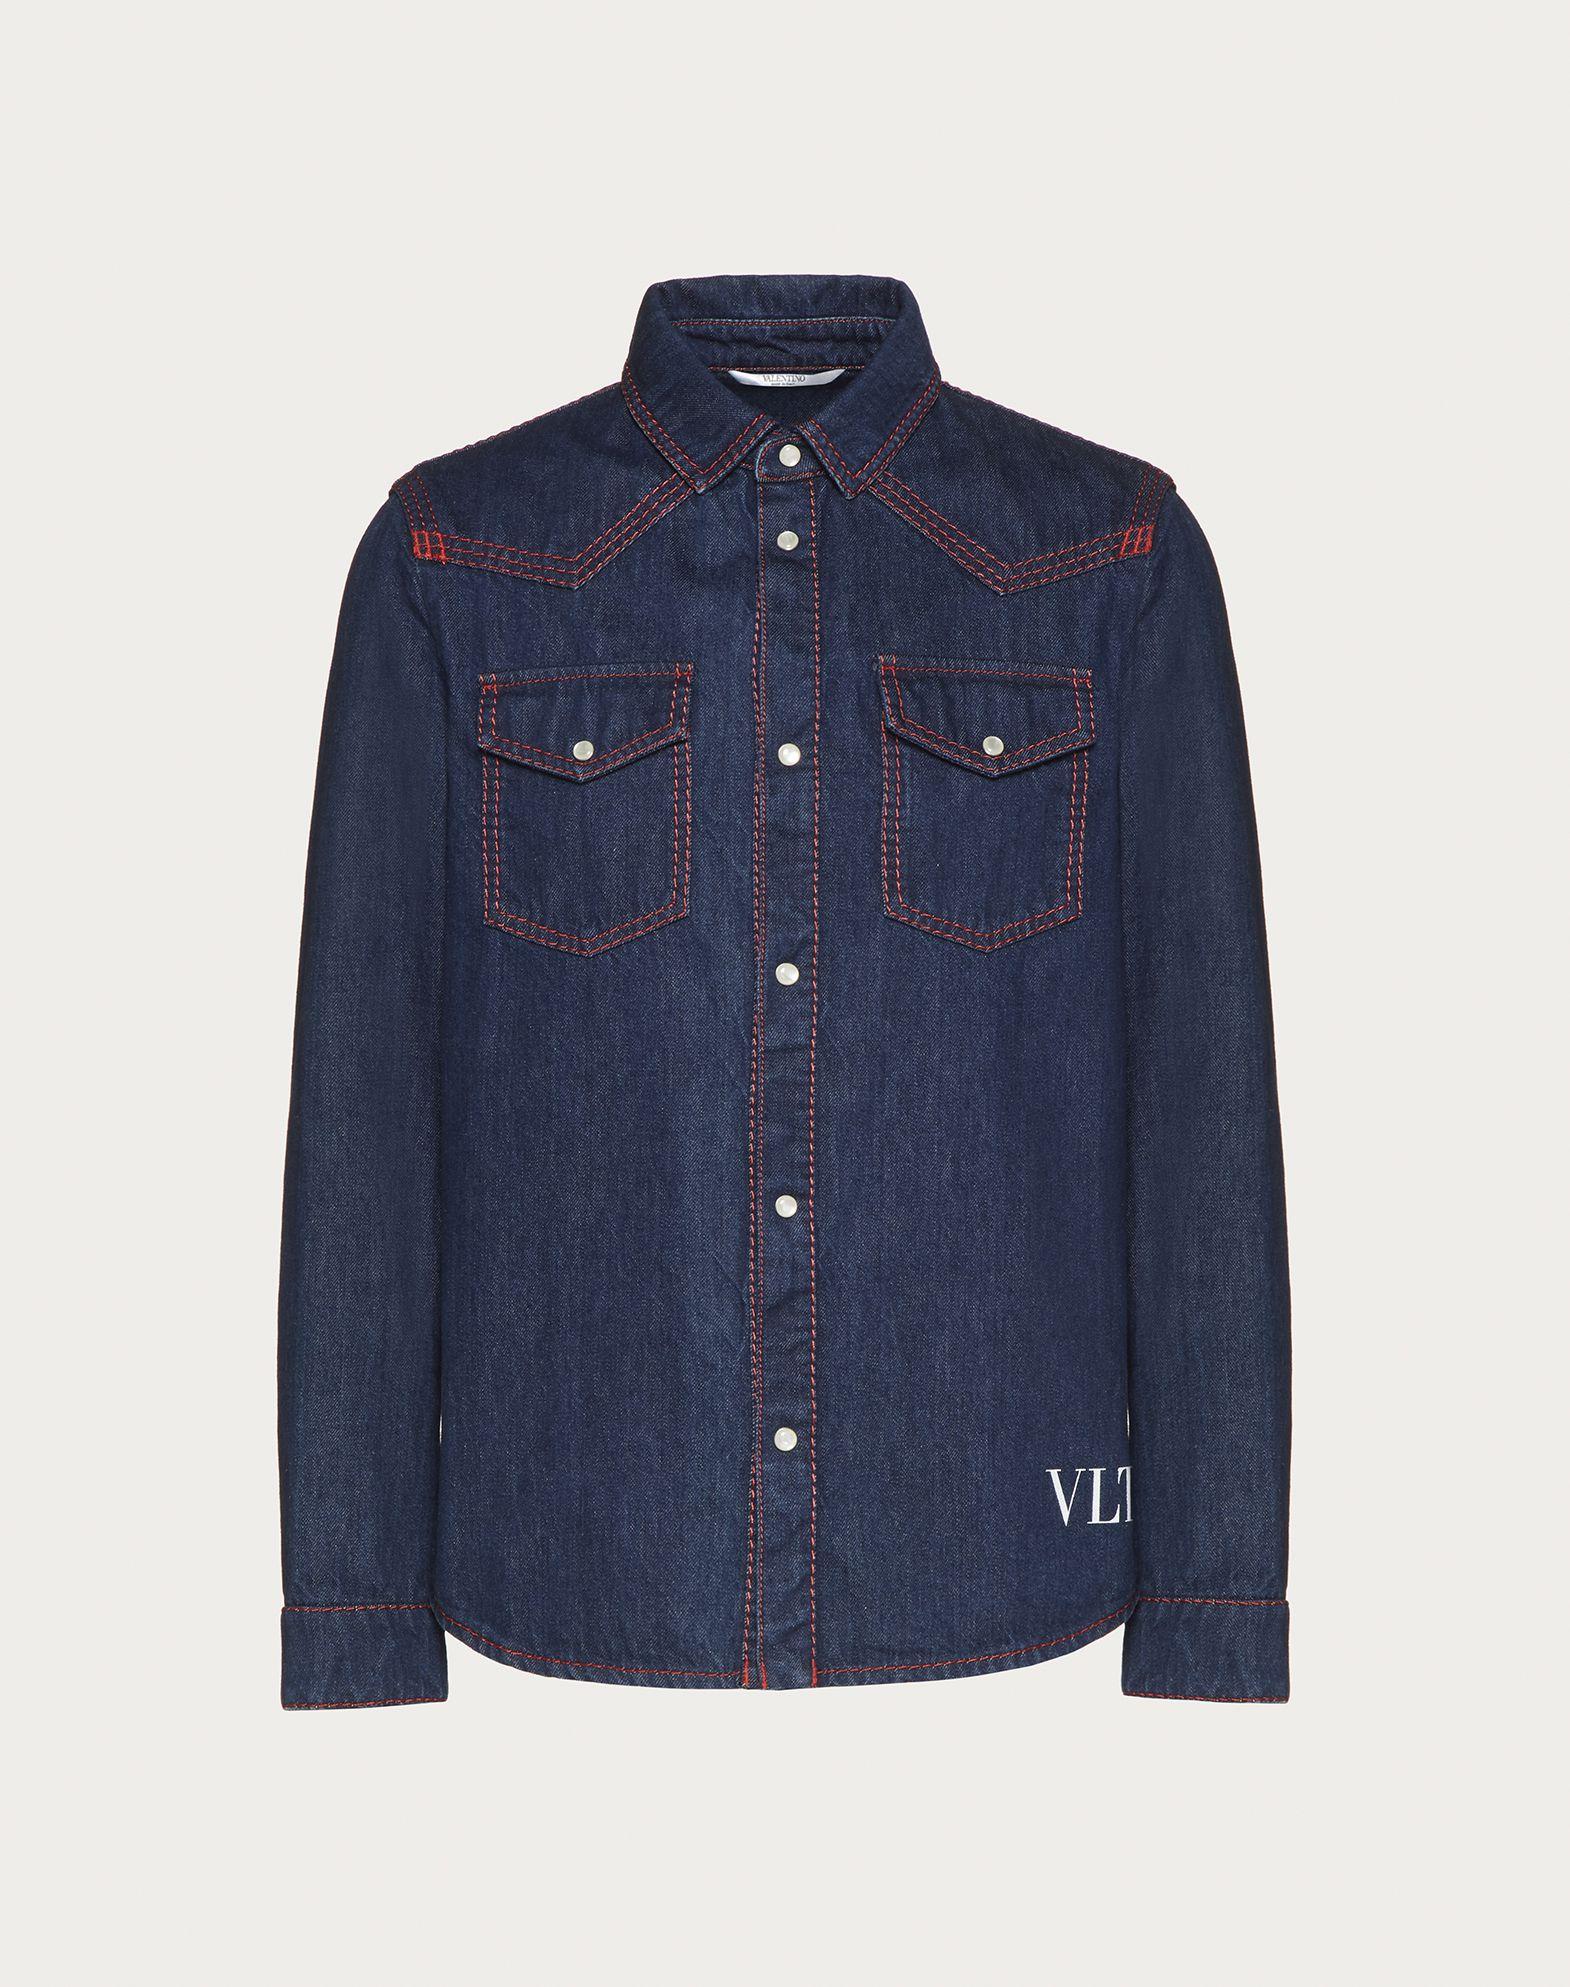 VALENTINO UOMO Camisa de denim VLTN Camisa U f